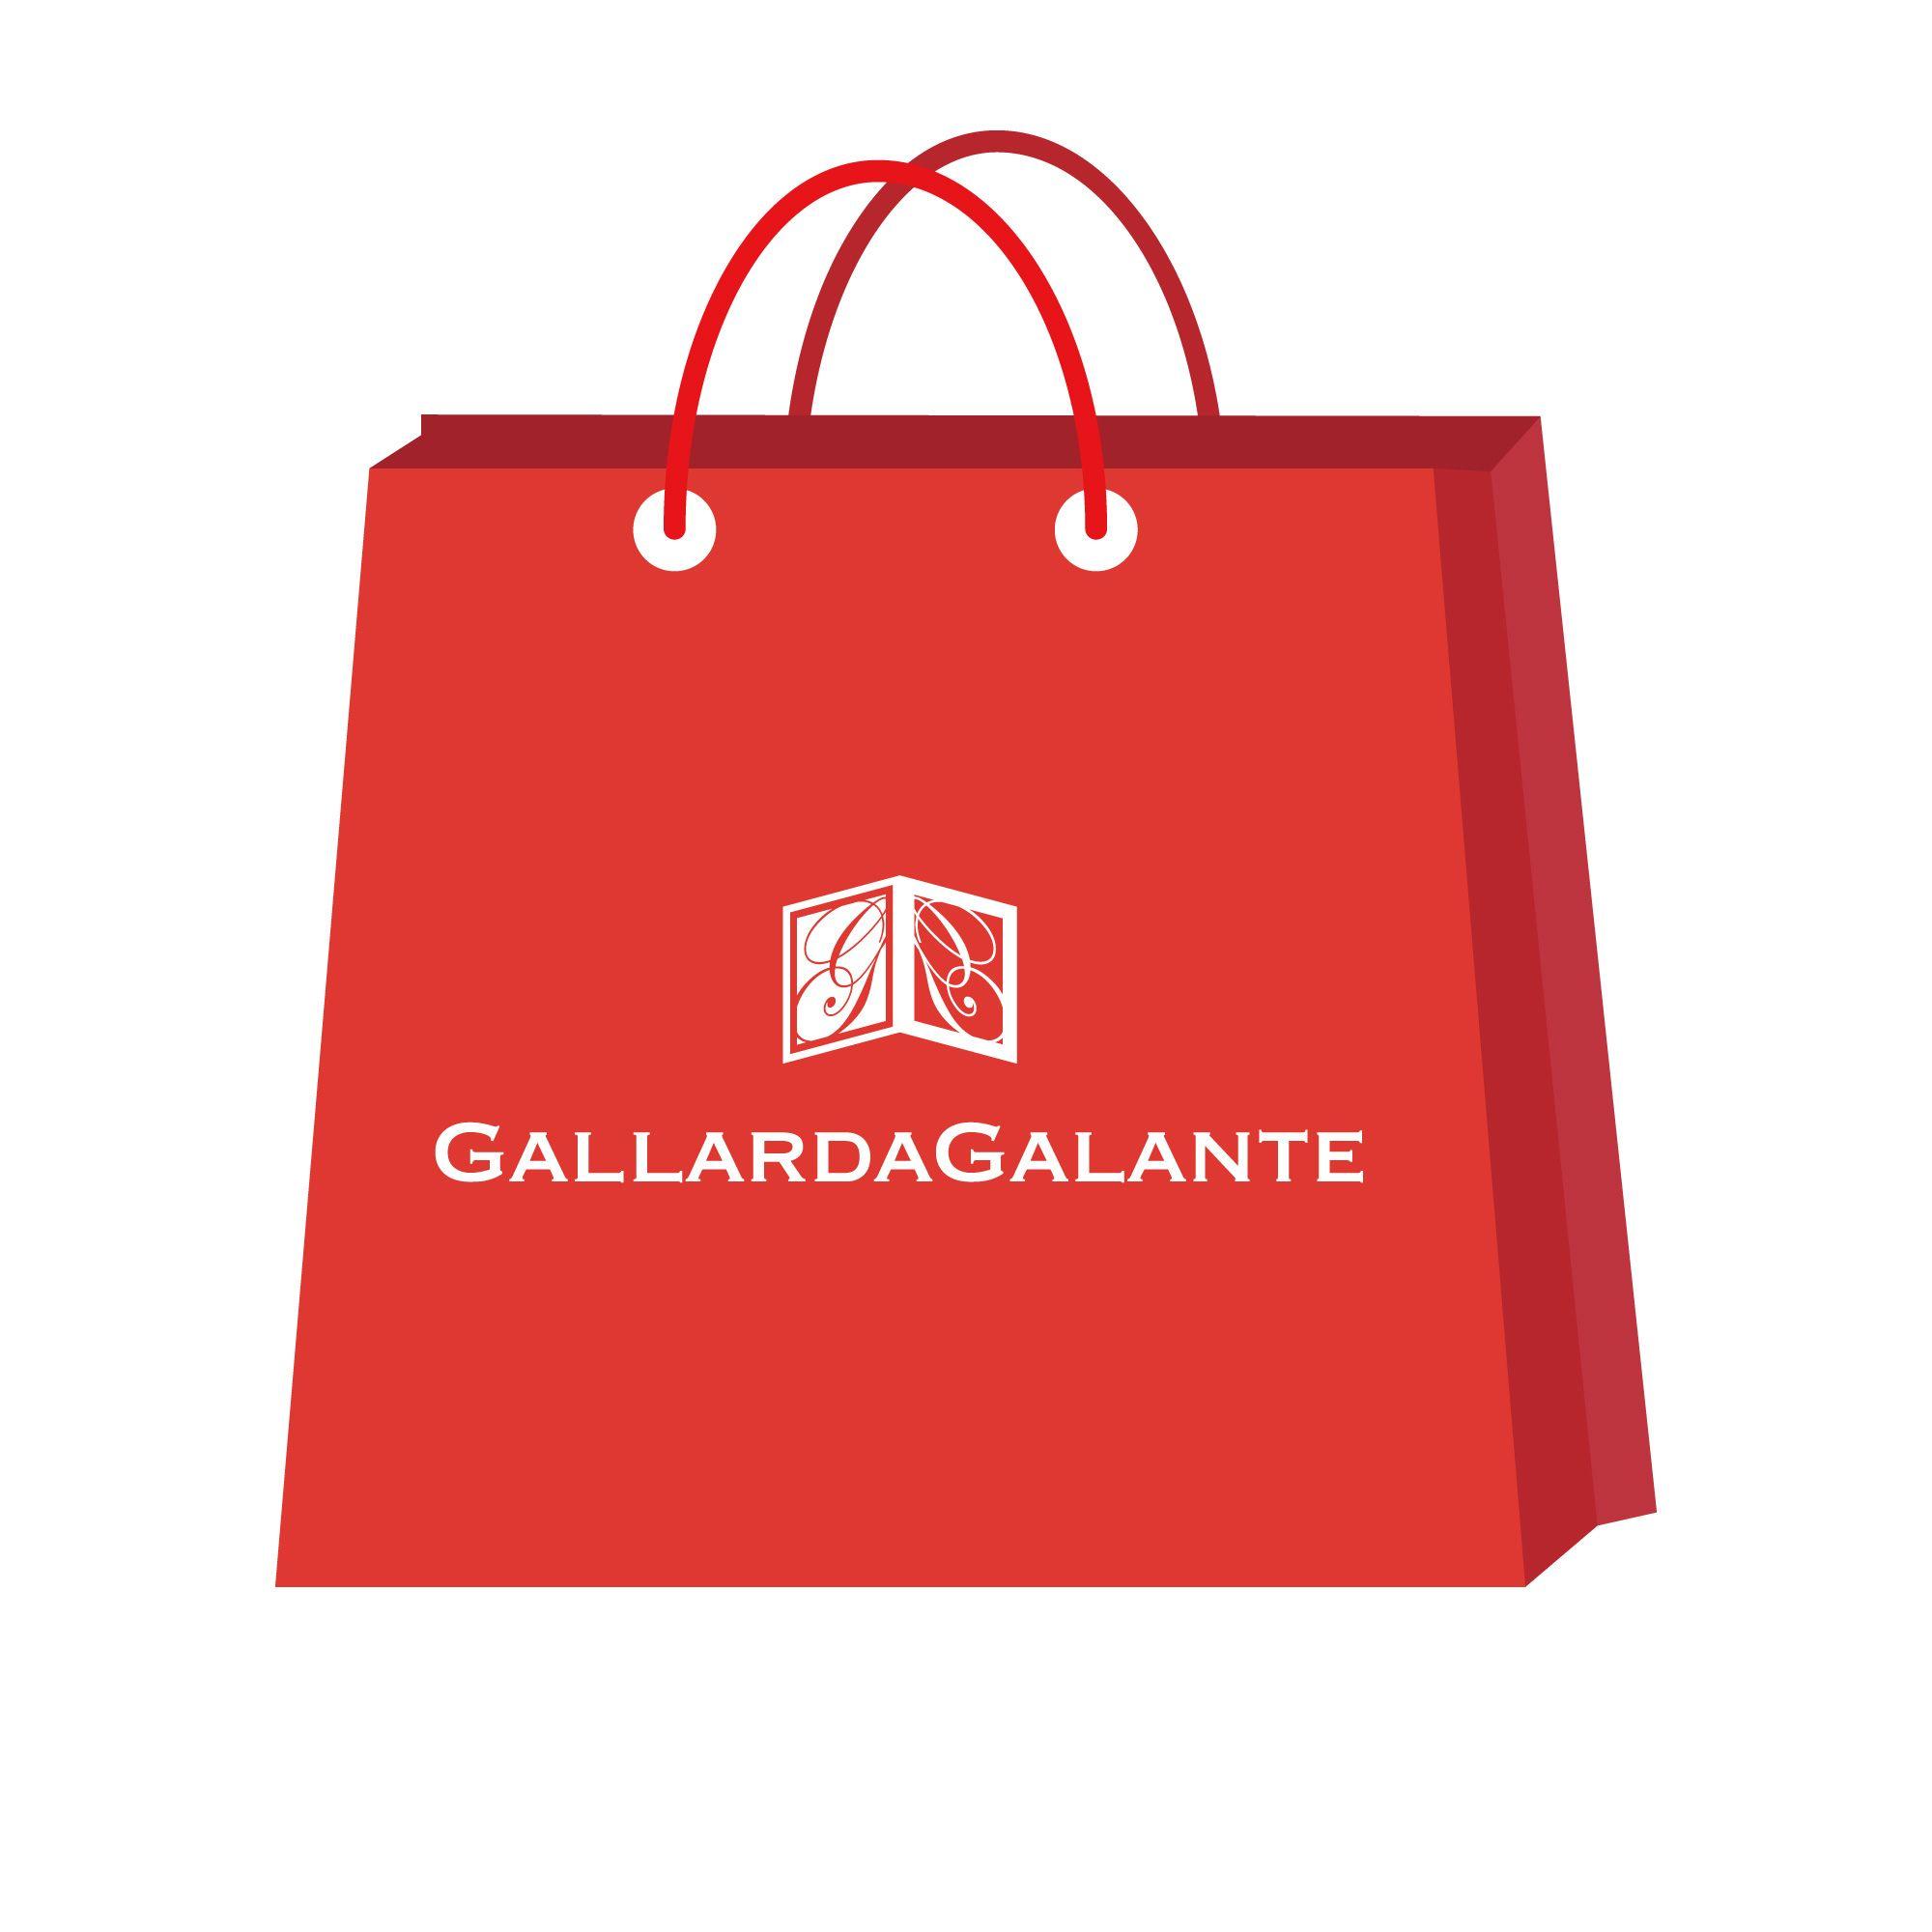 【2019福袋】GALLARDAGALANTE